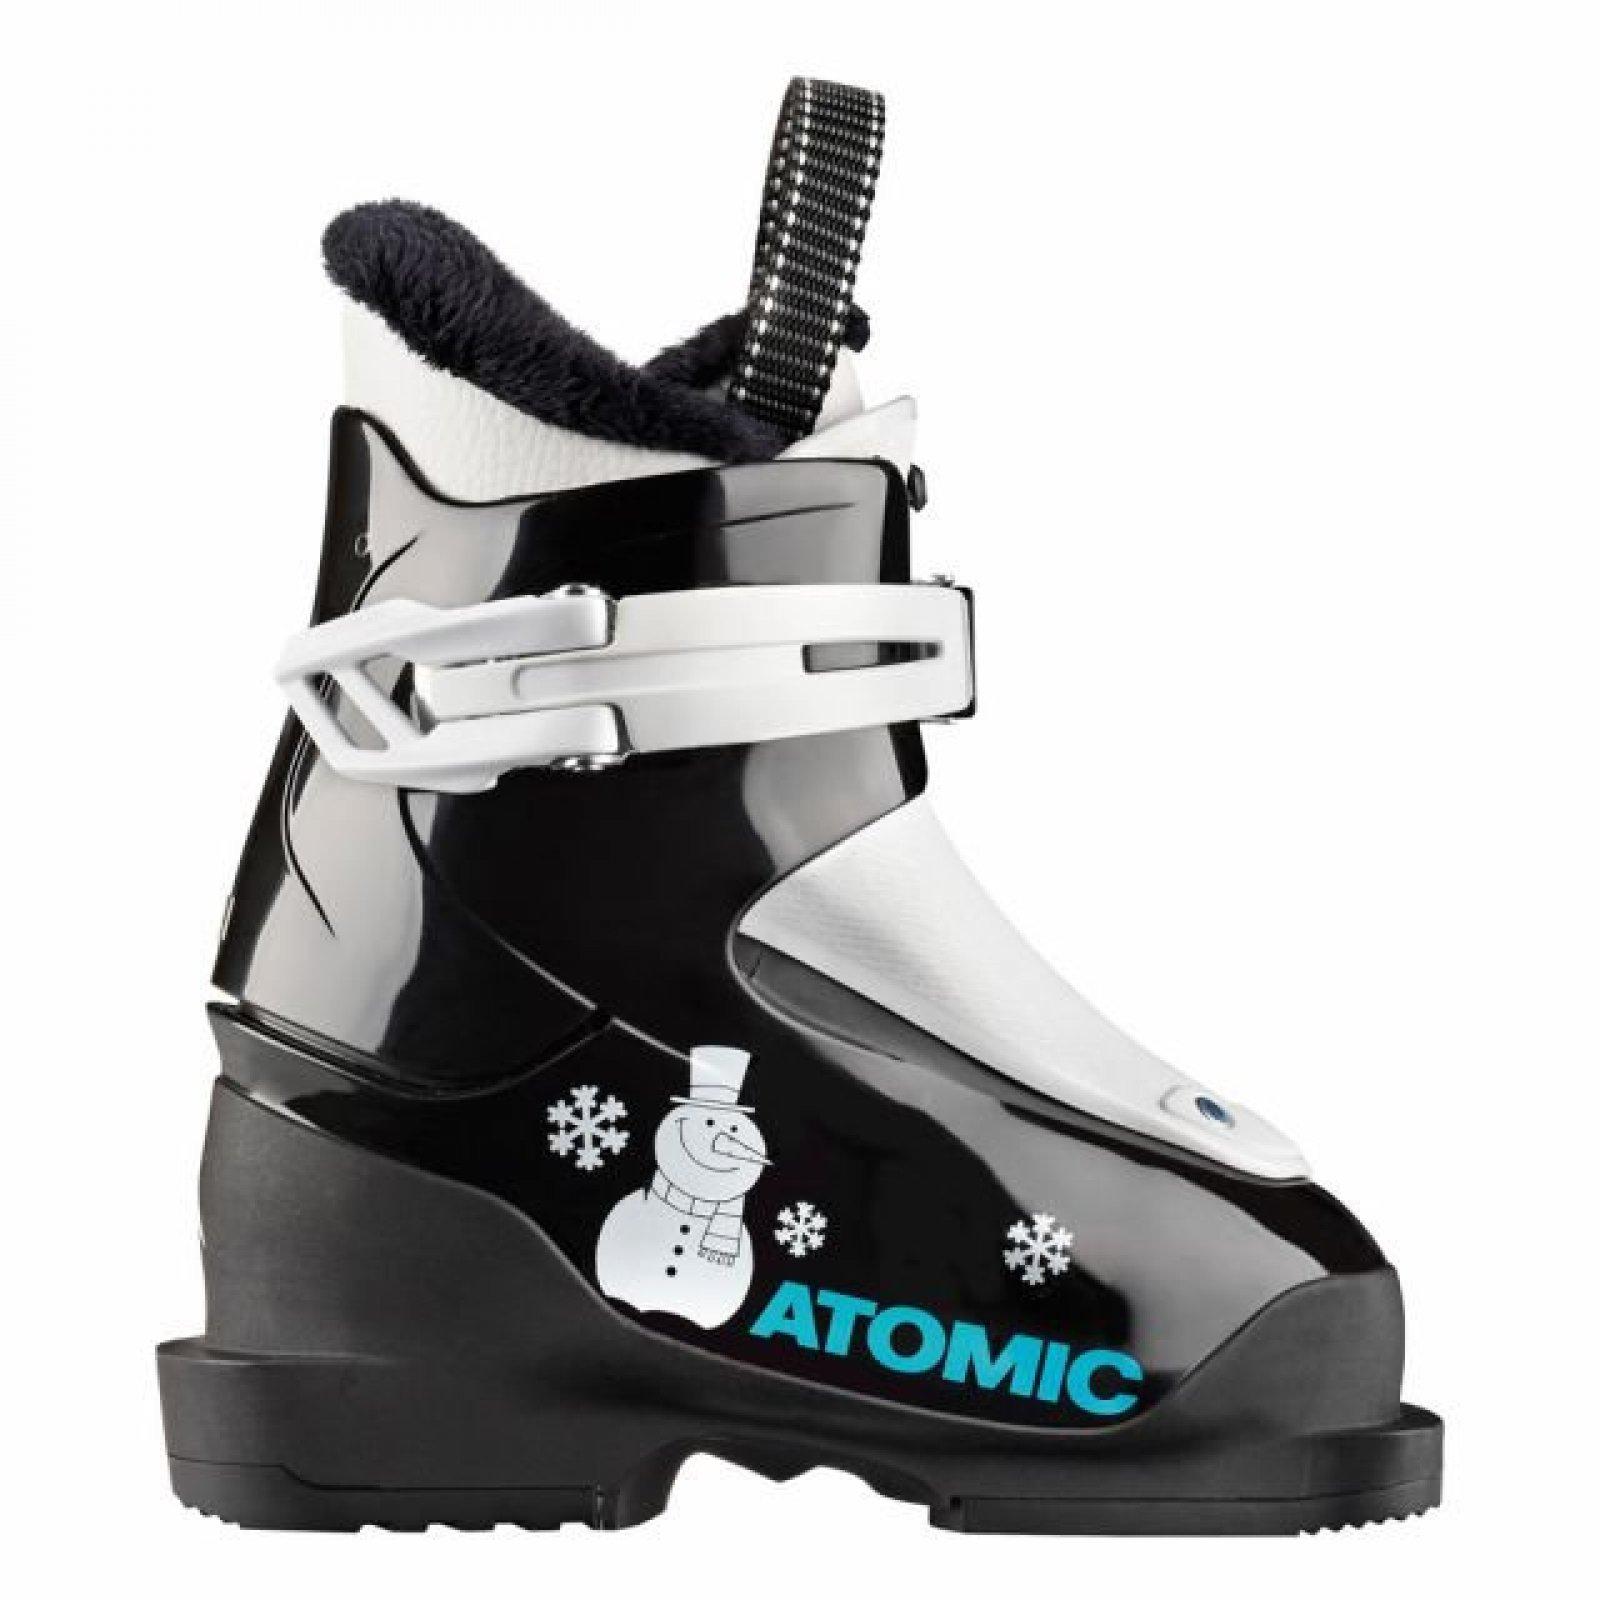 Sjezdové boty Atomic Hawx JR 1 Black White AE5018840 18 19 ... b83f0e1efe7